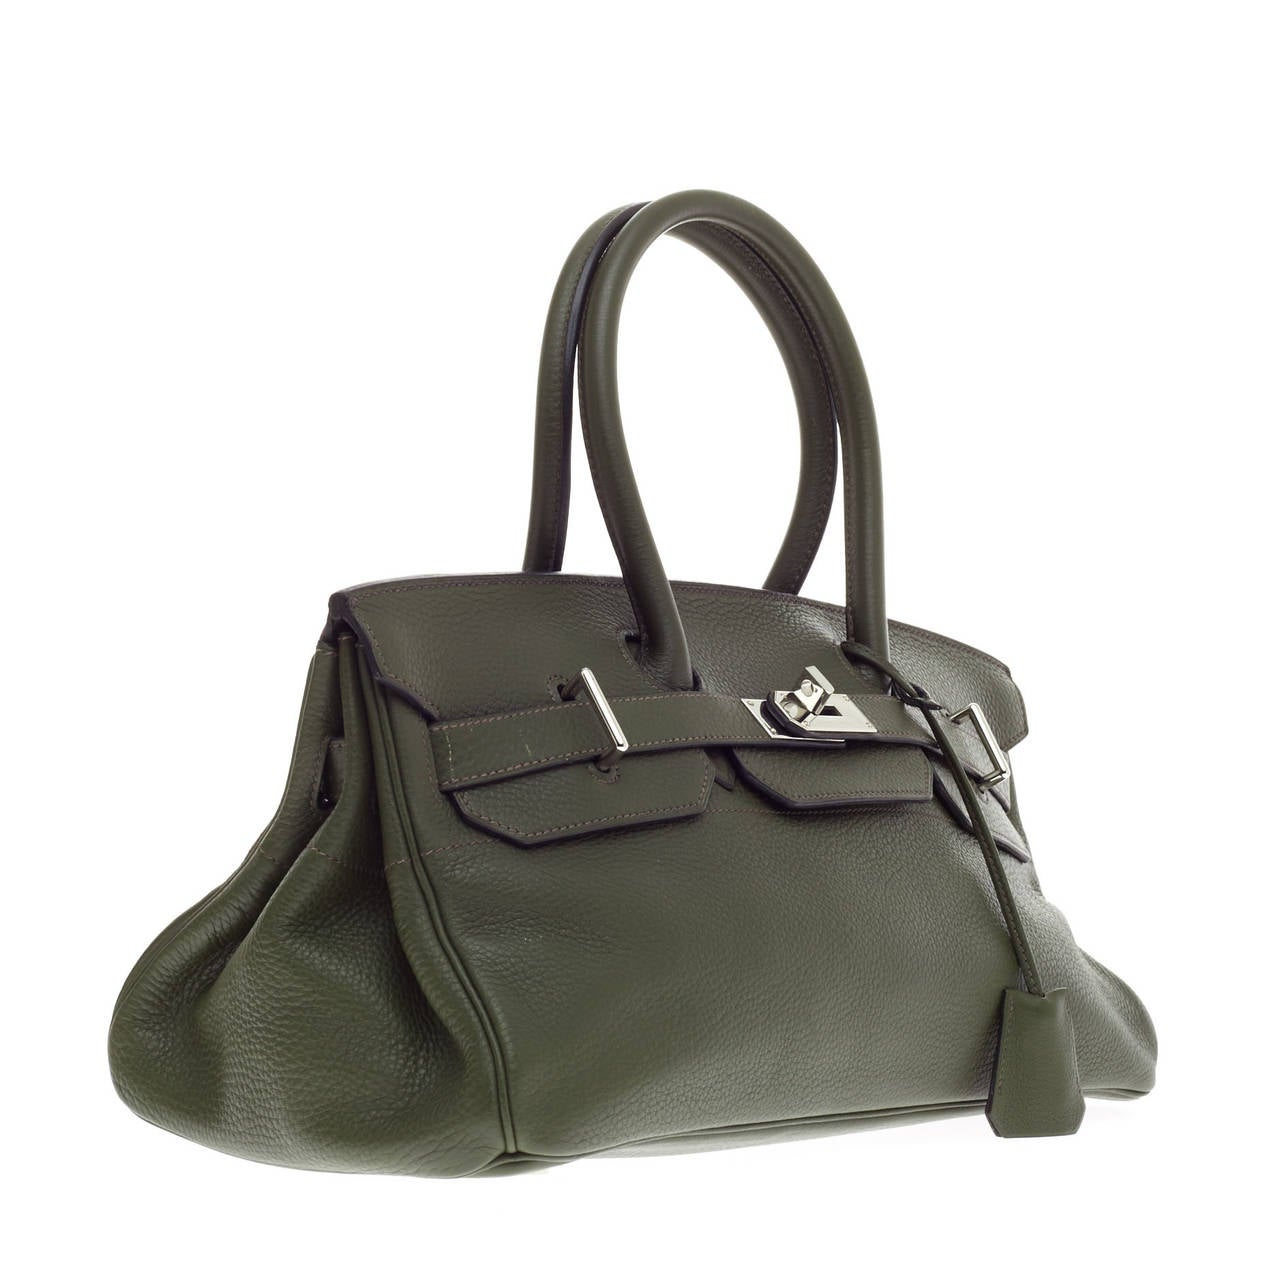 used birkin bags for sale hermes - hermes clemence jpg birkin, inexpensive leather purses